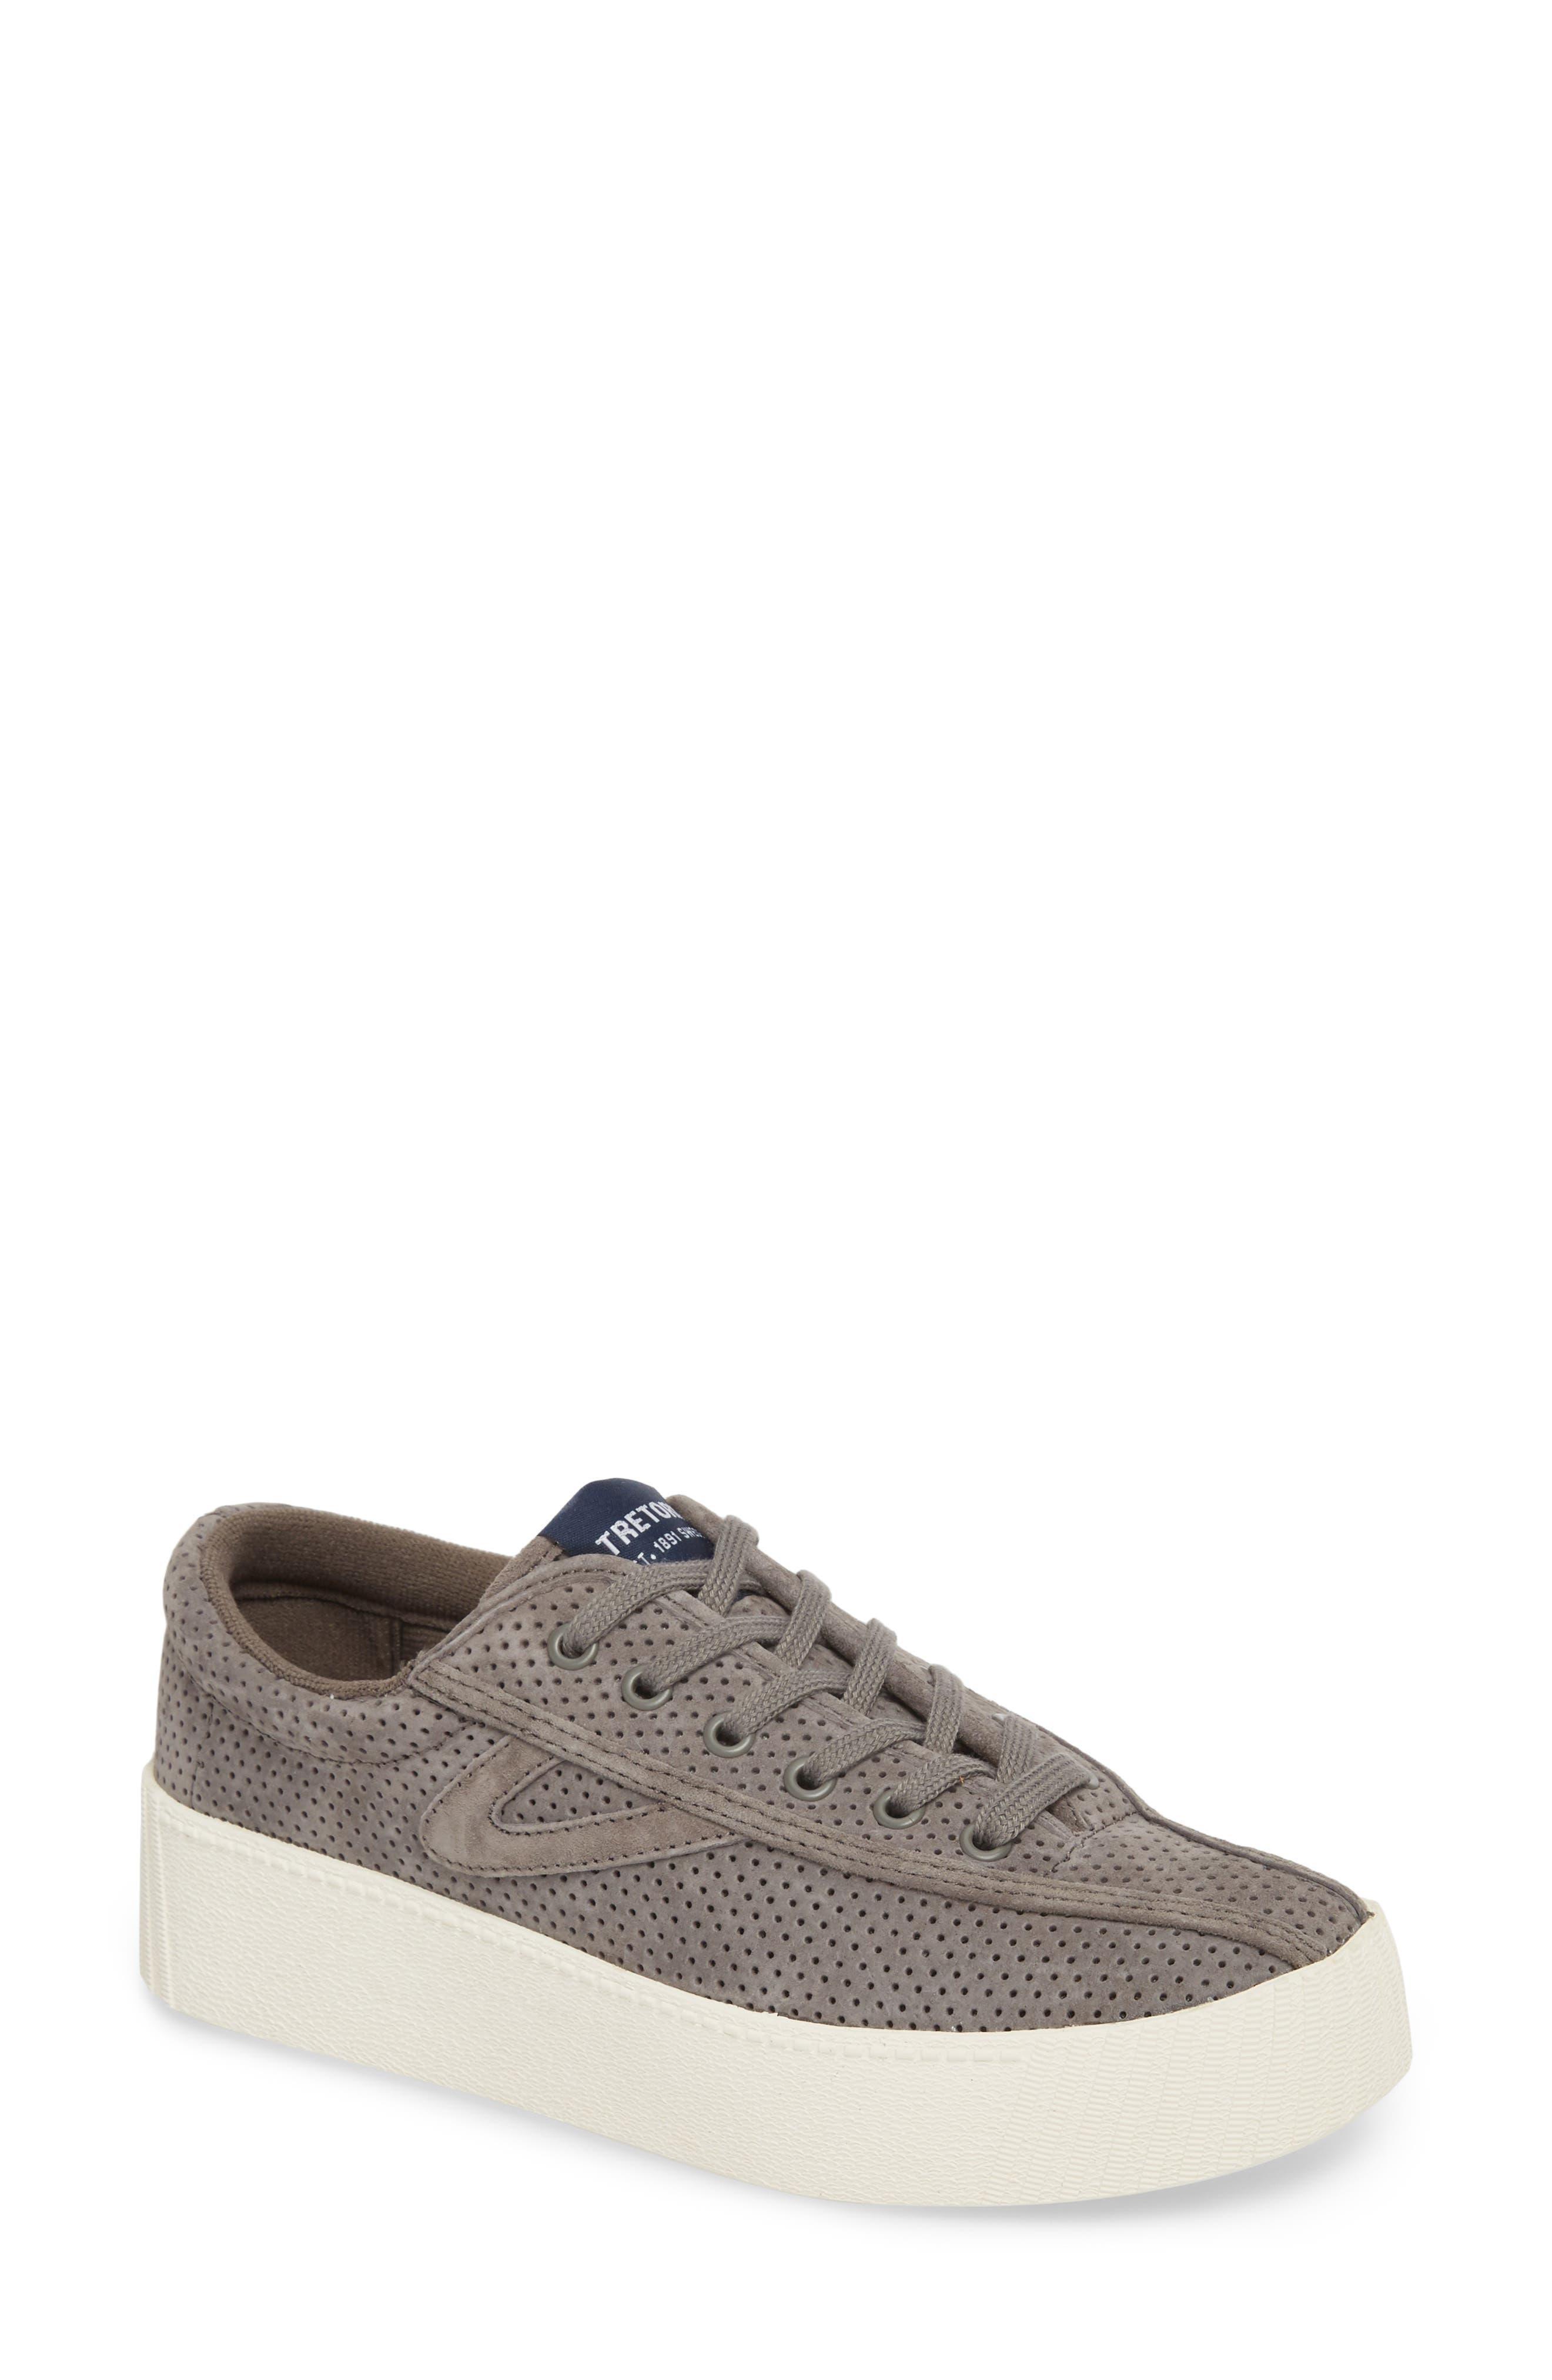 Bold Perforated Platform Sneaker, Main, color, GRAPHITE/ GRAPHITE